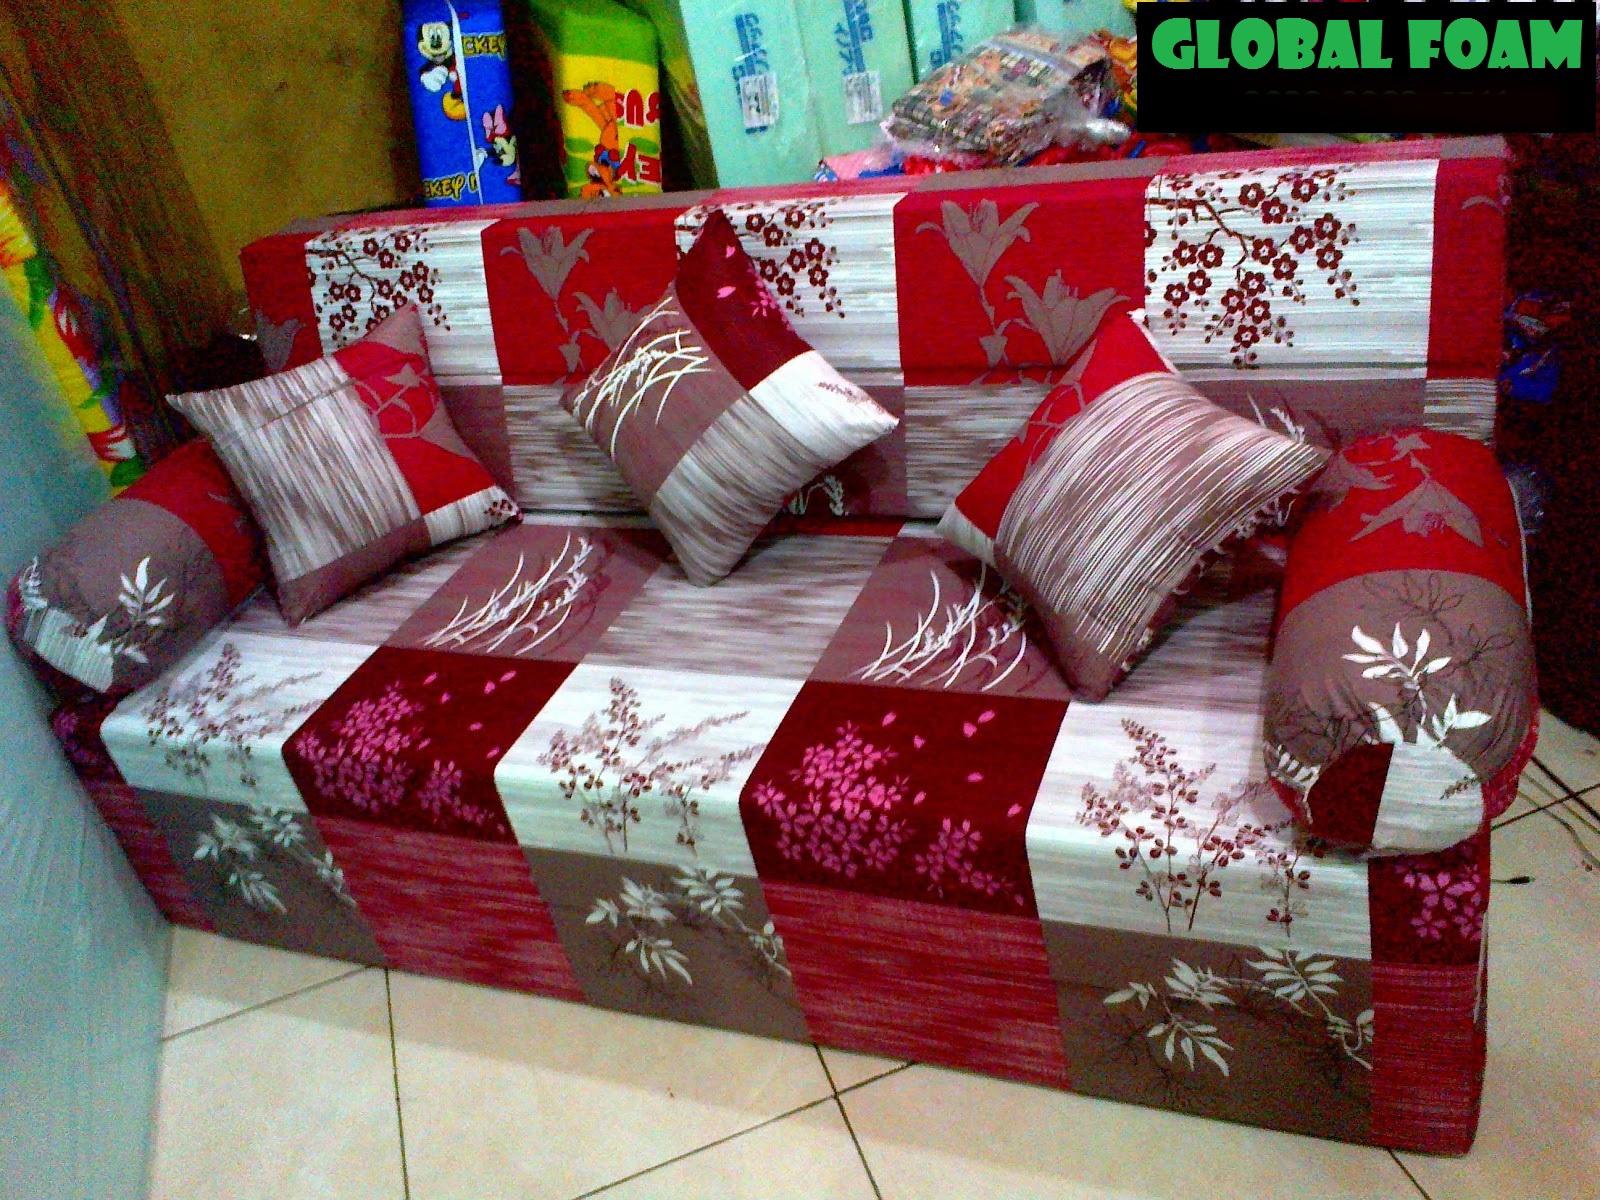 harga sofa bed inoac no 1 cushion cover ideas kasur 2018 distributor dan agen resmi